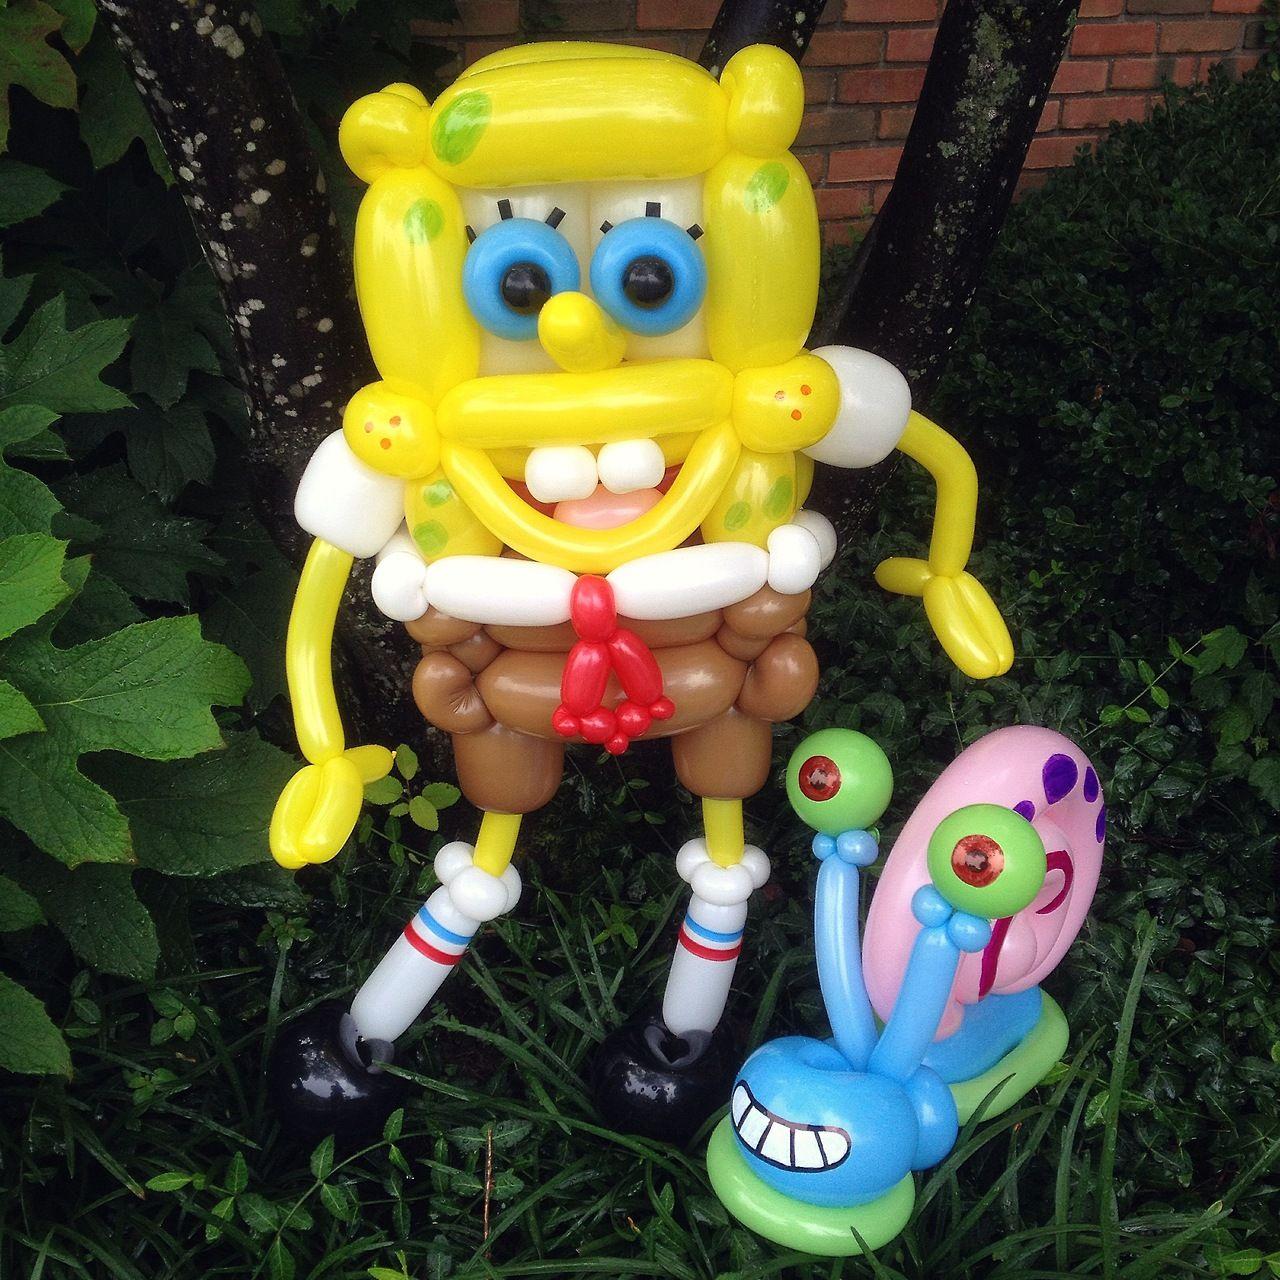 who lives in a pineapple under the sea u2026 sponge bob square pants